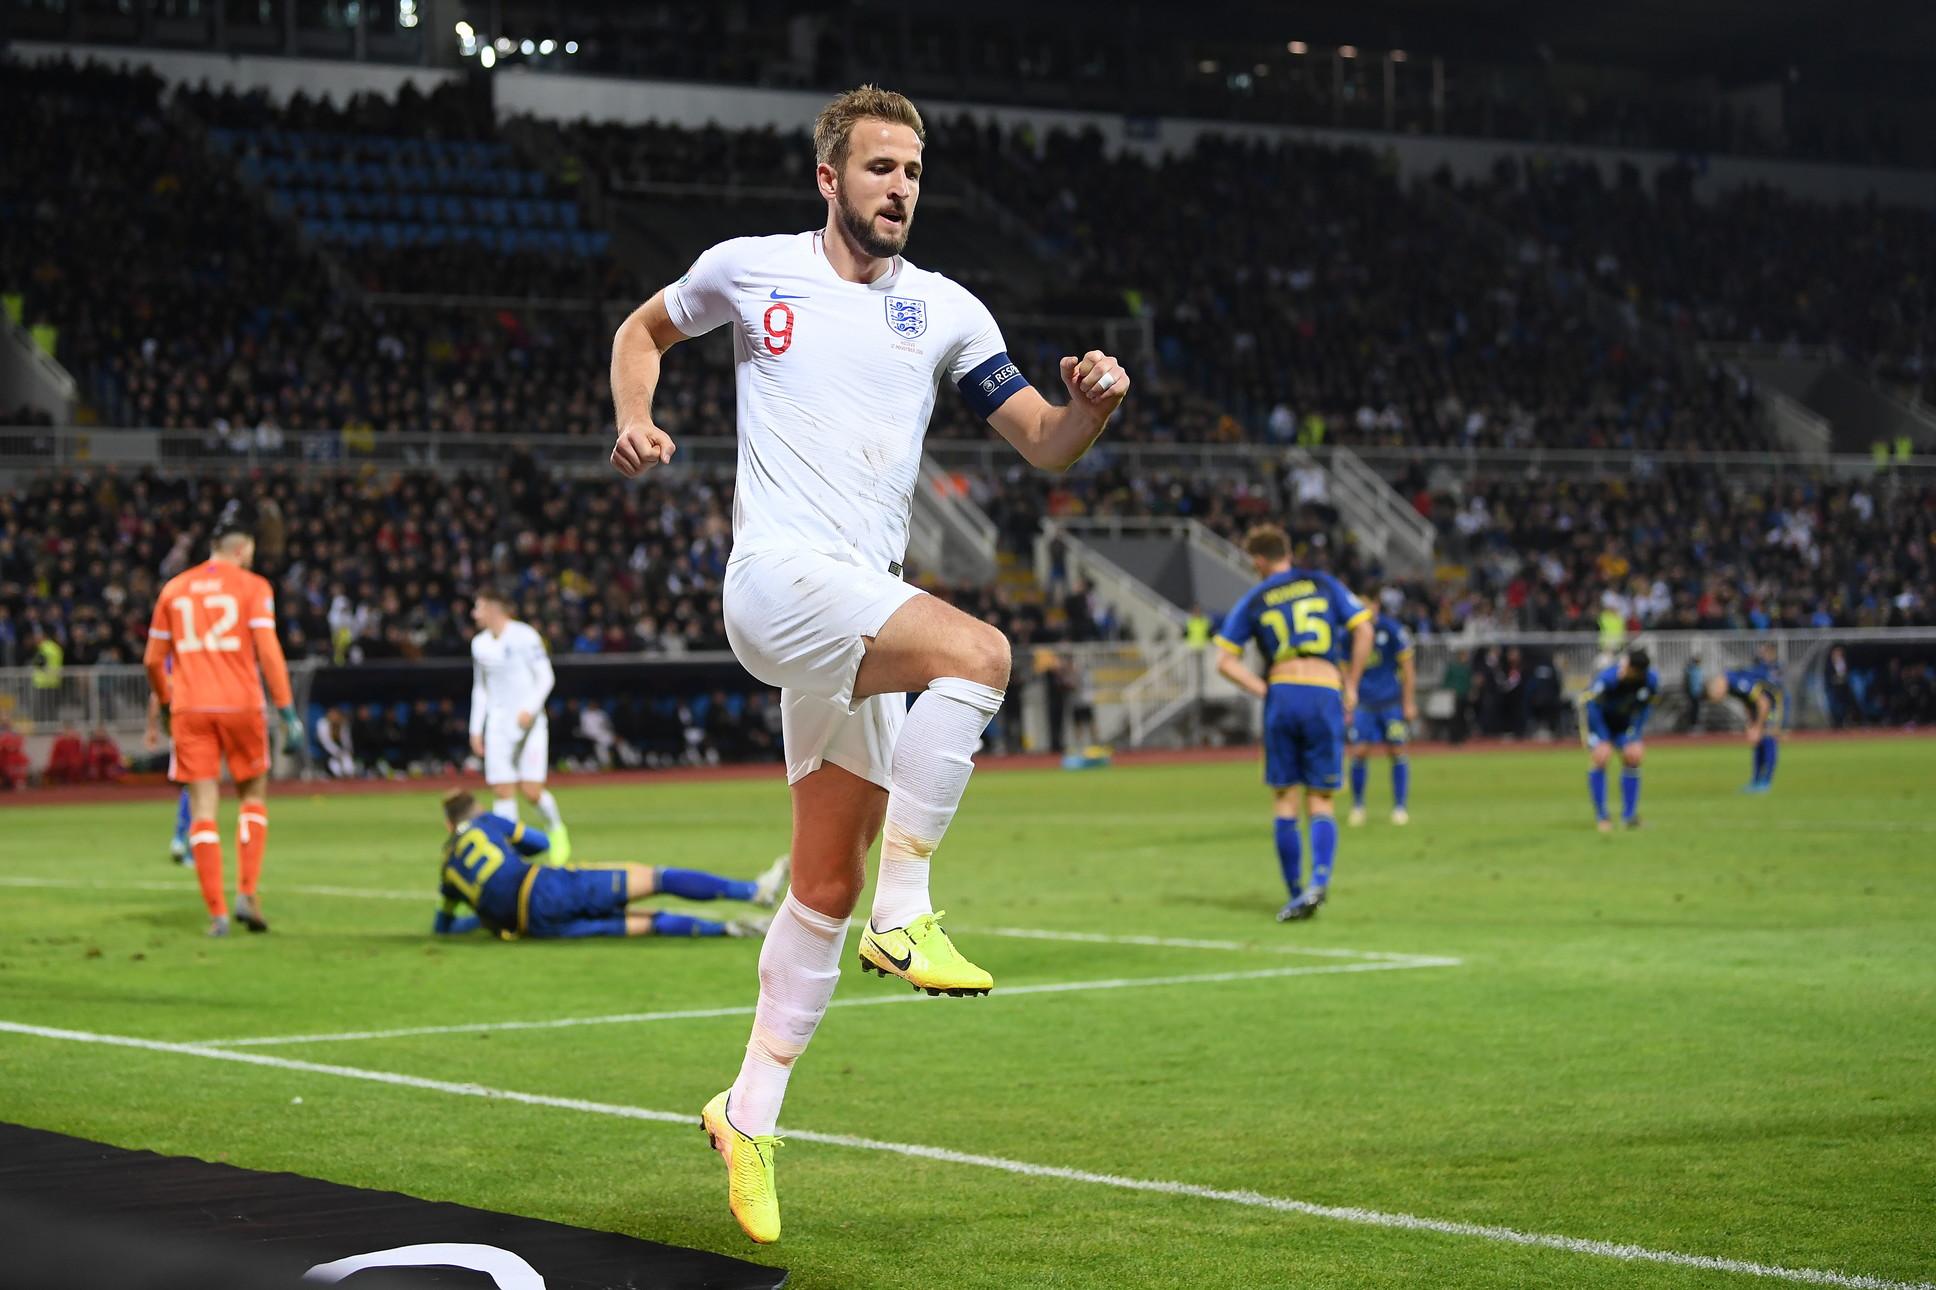 2) Kane, Inghilterra/Tottenham: 120 milioni di euro